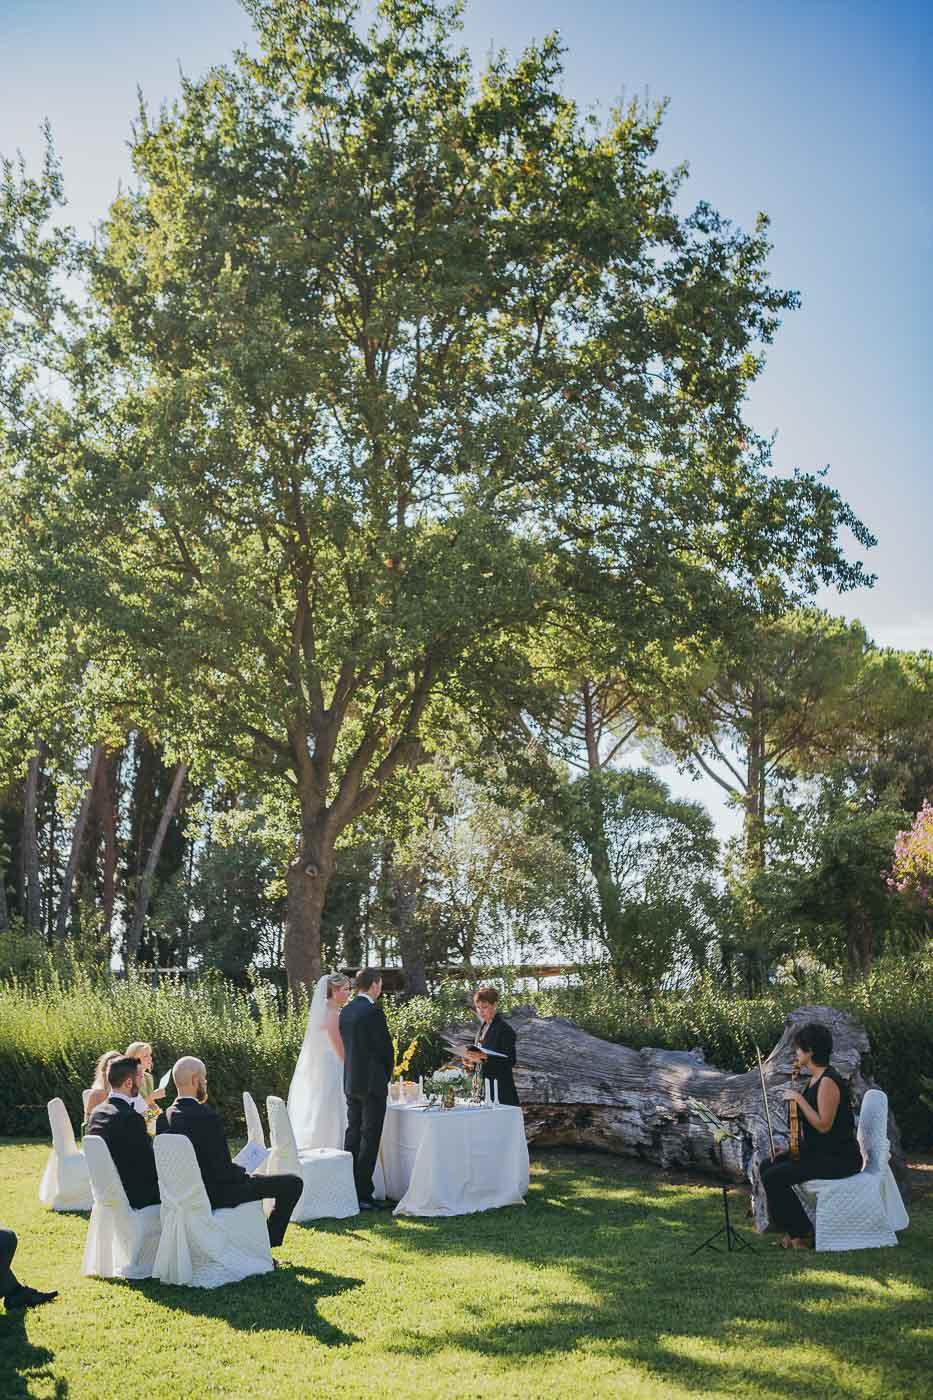 Matrimonio Tra Gli Ulivi Toscana : Matrimonio saturnia acquaviva toscana maremma fotografo professionista